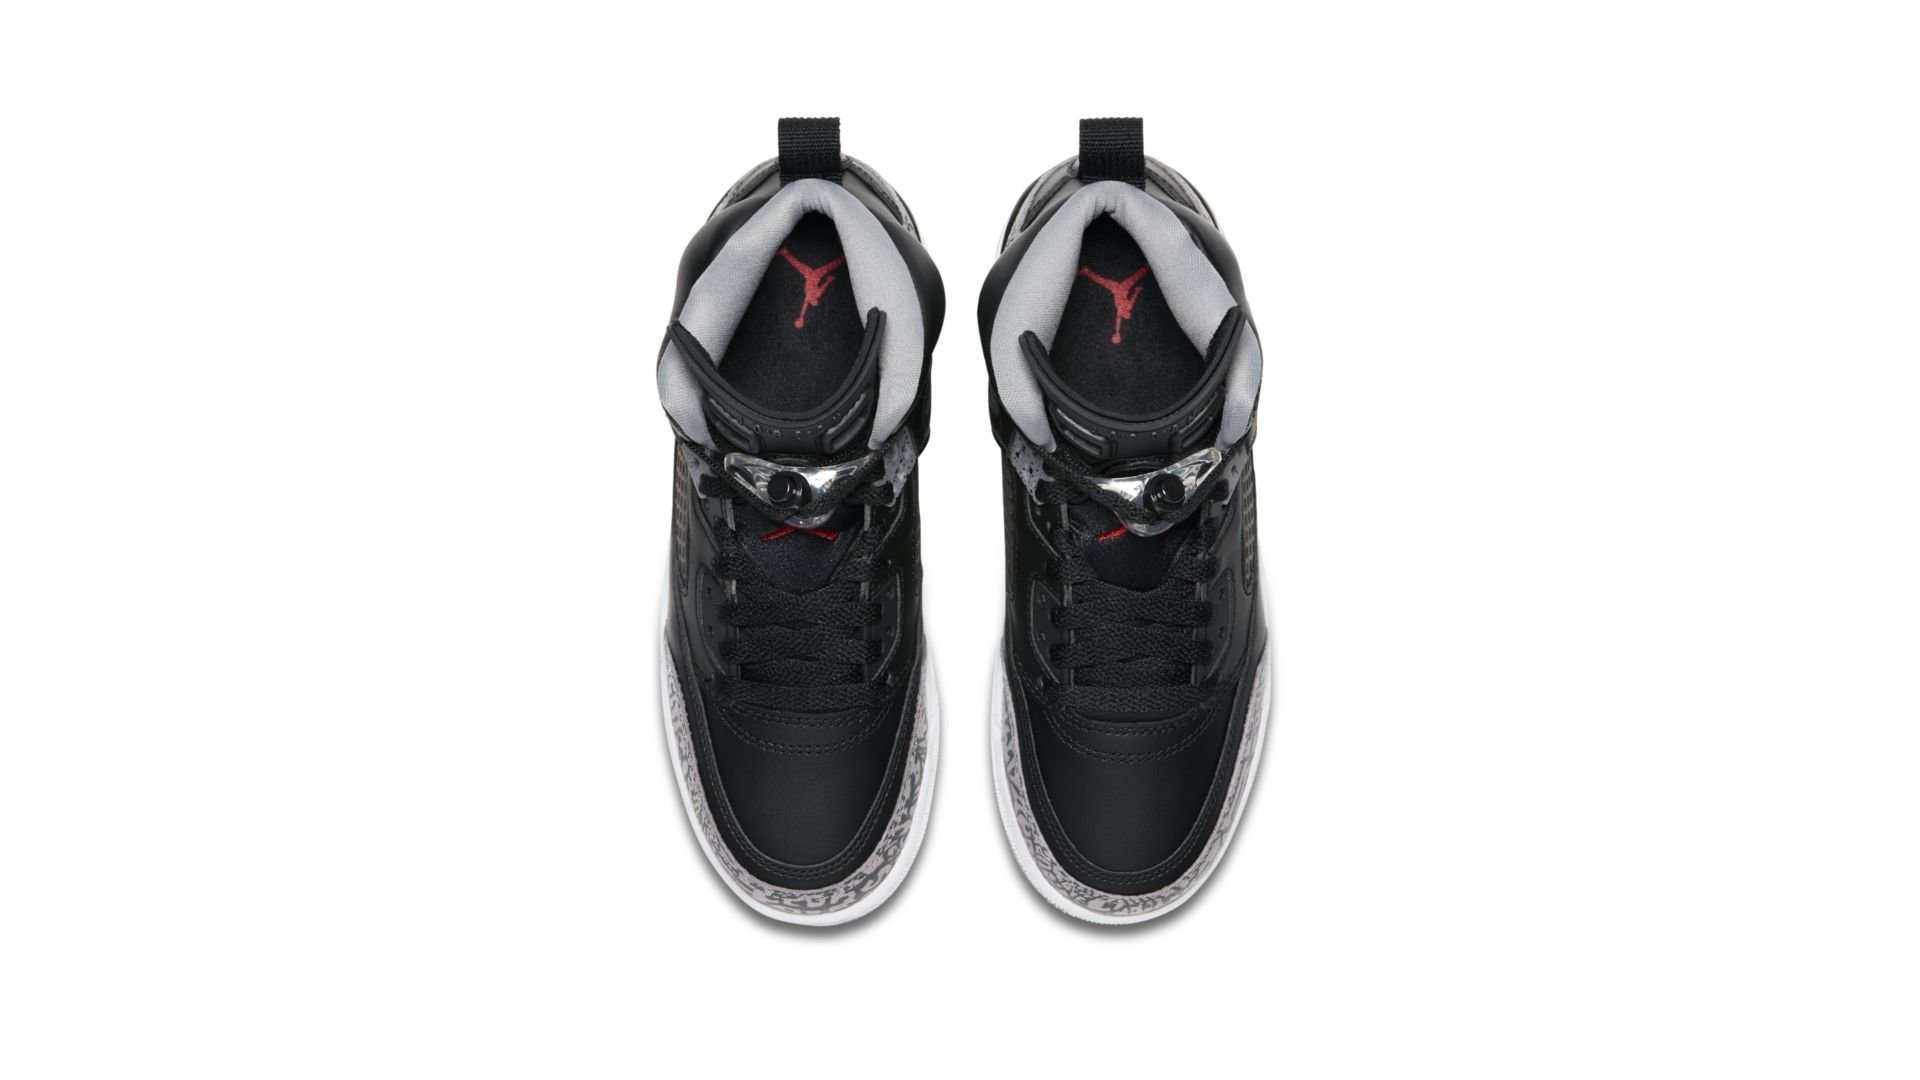 Jordan Spizike Black Cement (GS) (317321-034)